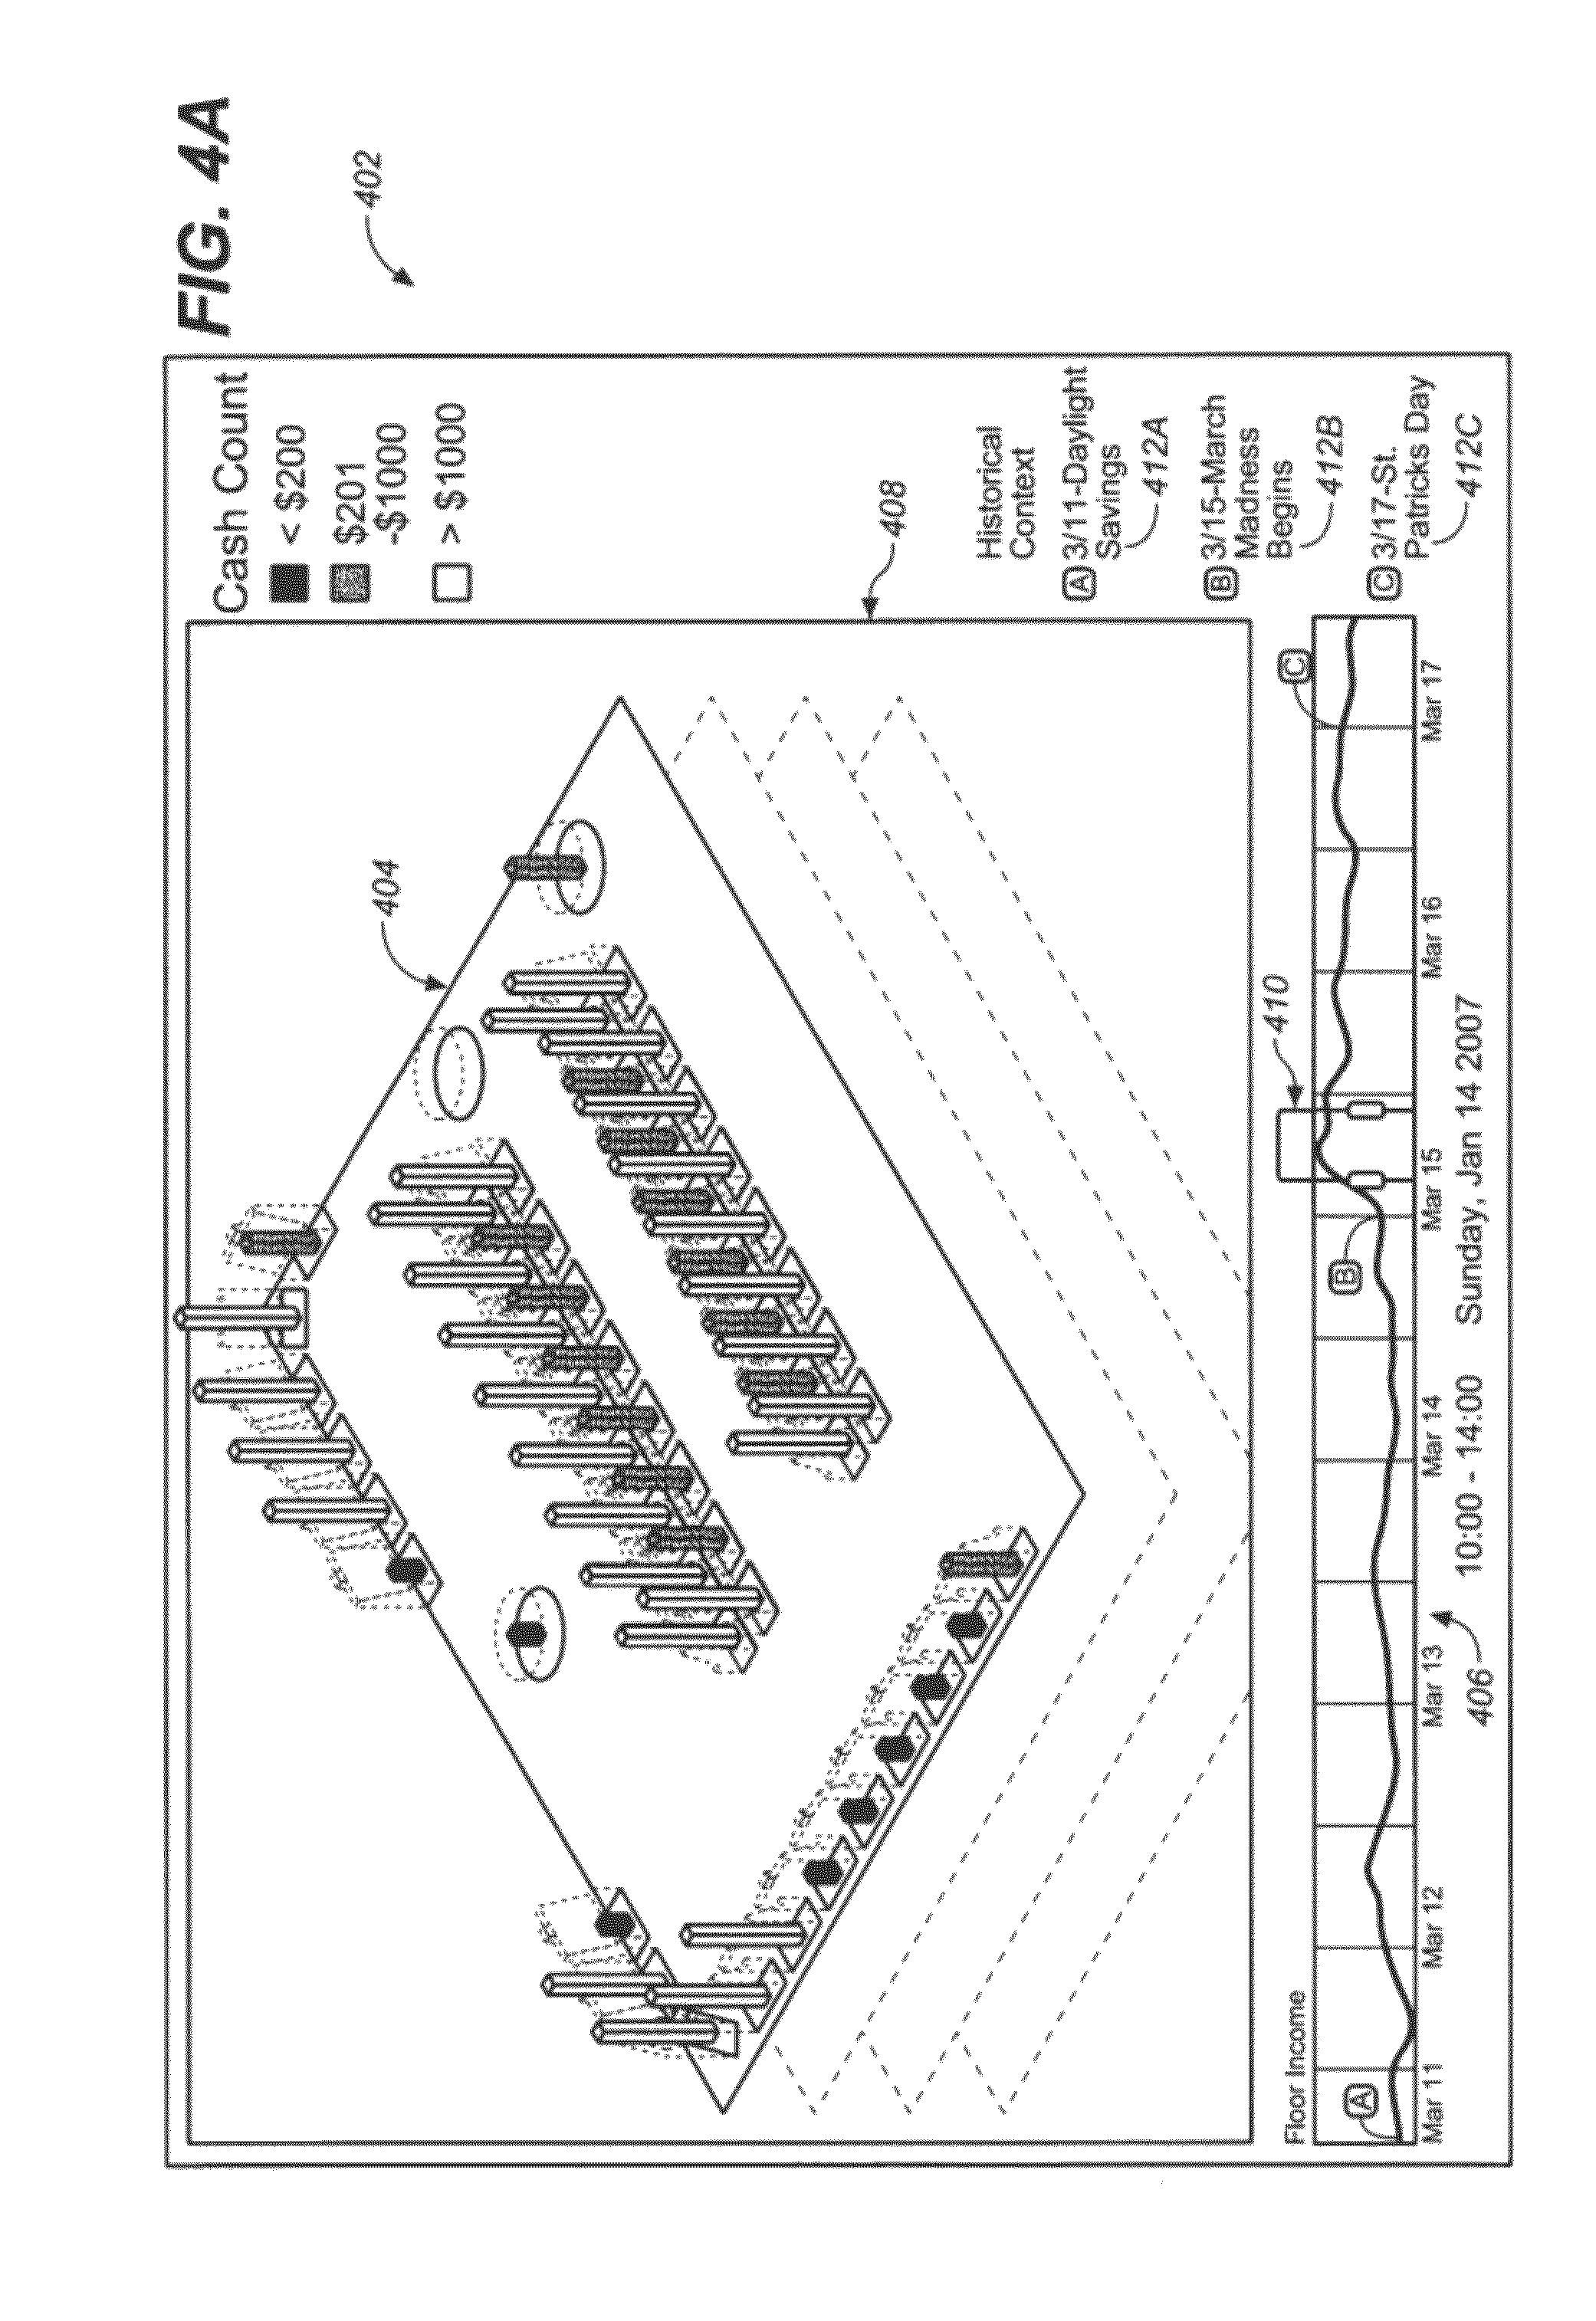 USB1 - Casino game - Google Patents